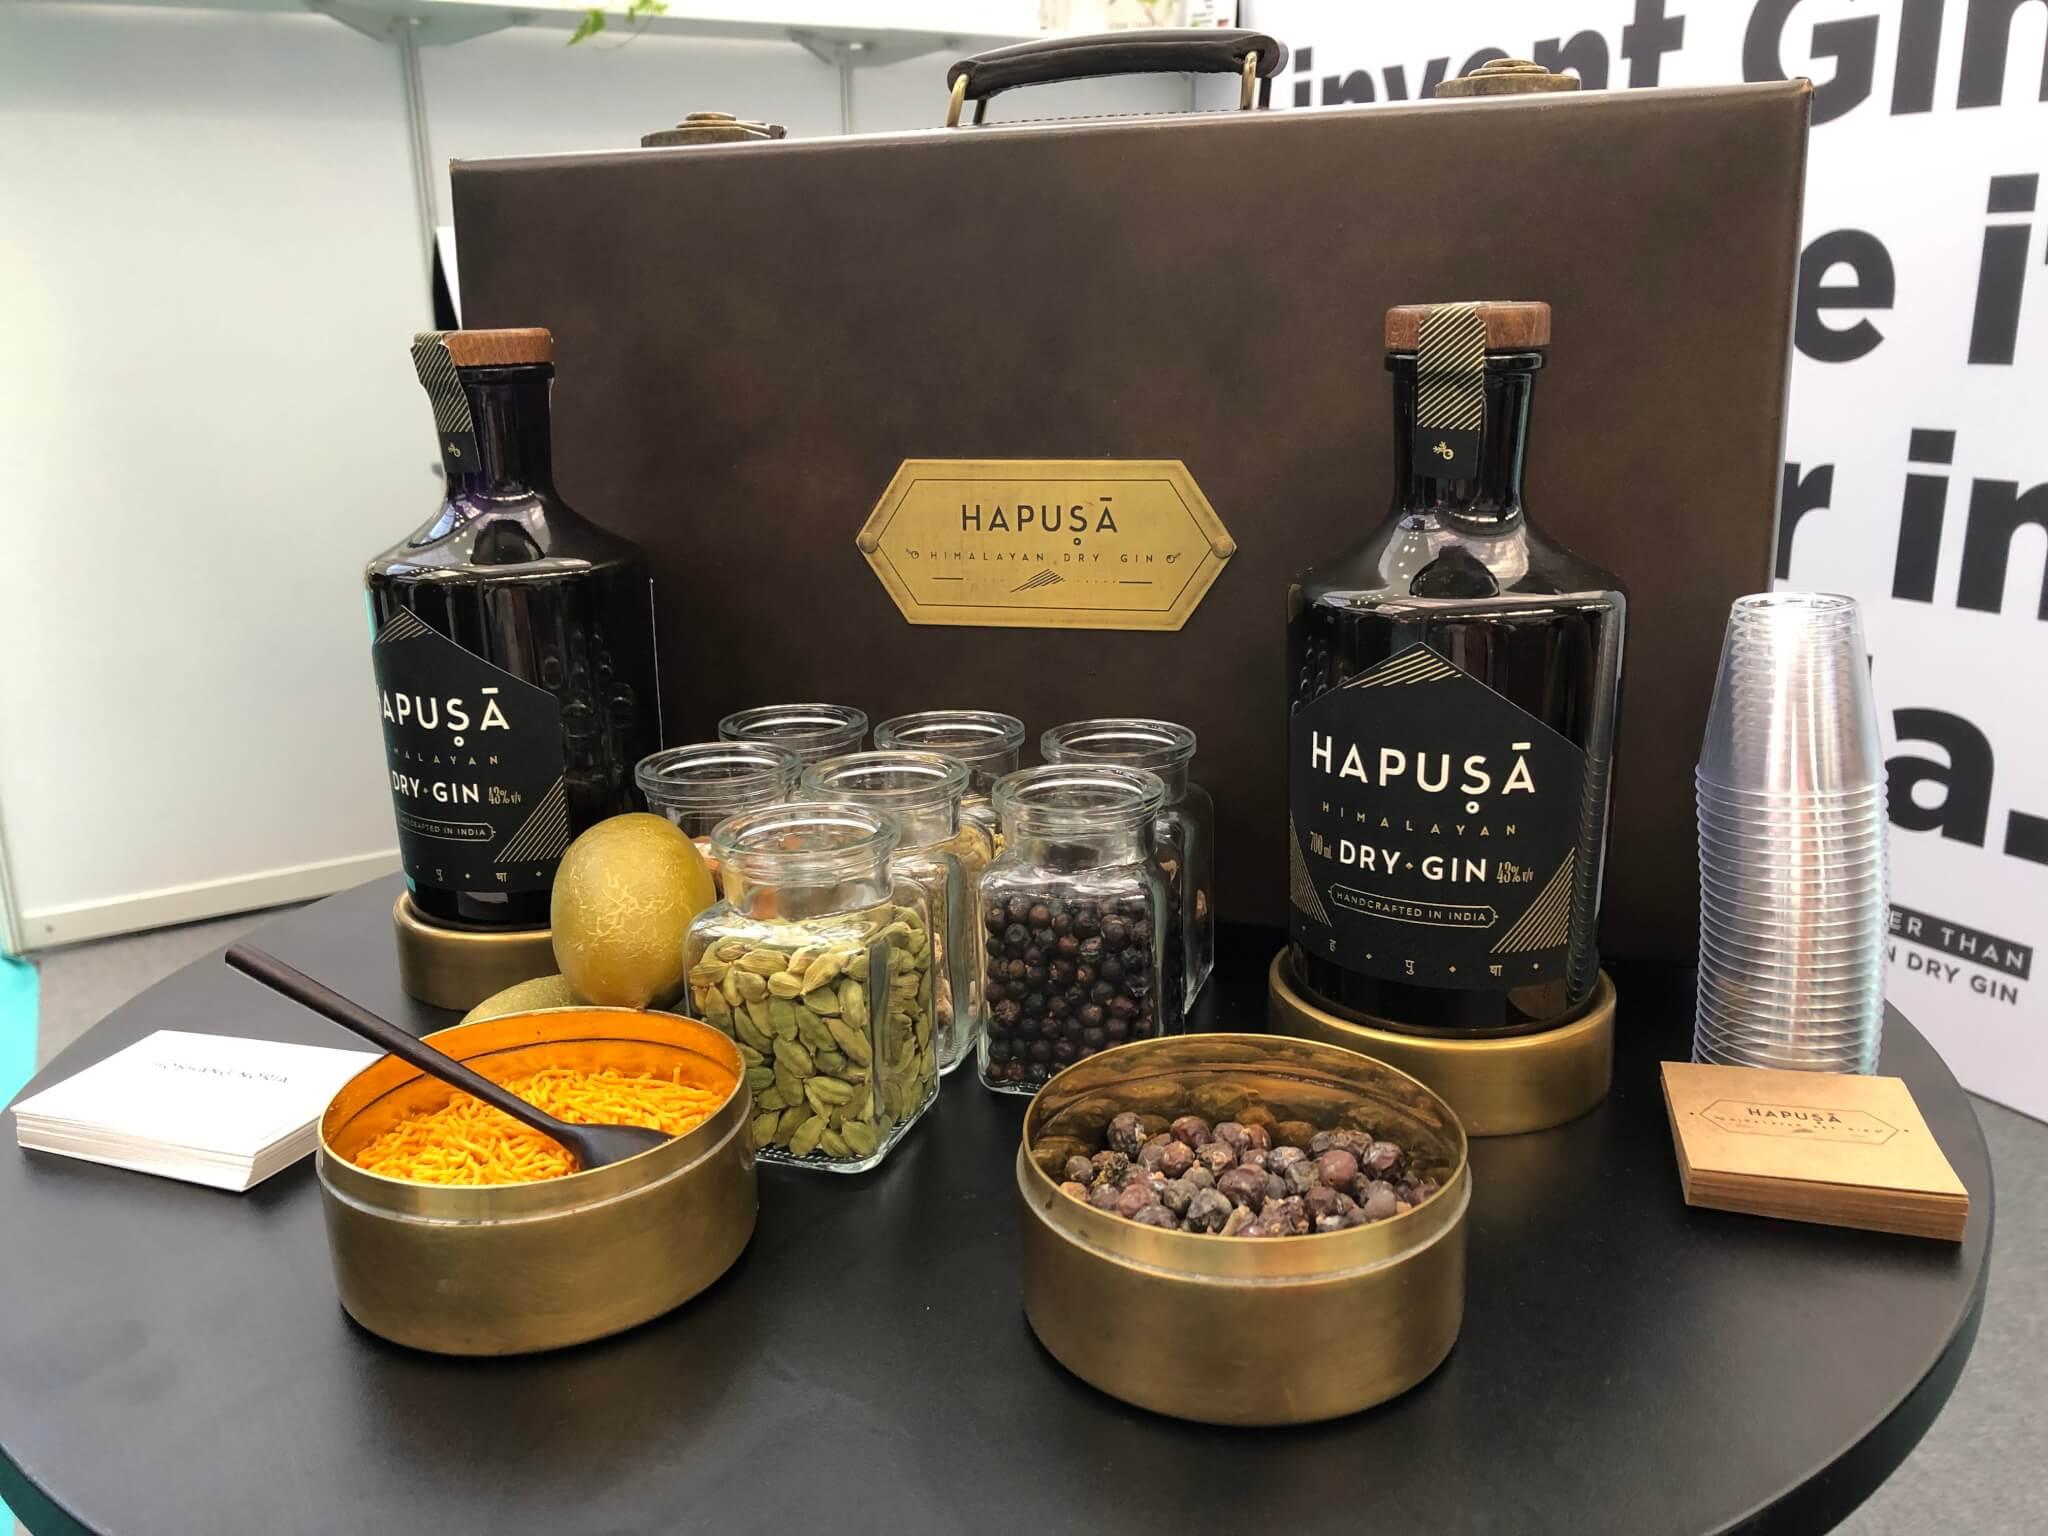 Hapusa dry gin, indian gin, nao spirits, gin npd, gin branding